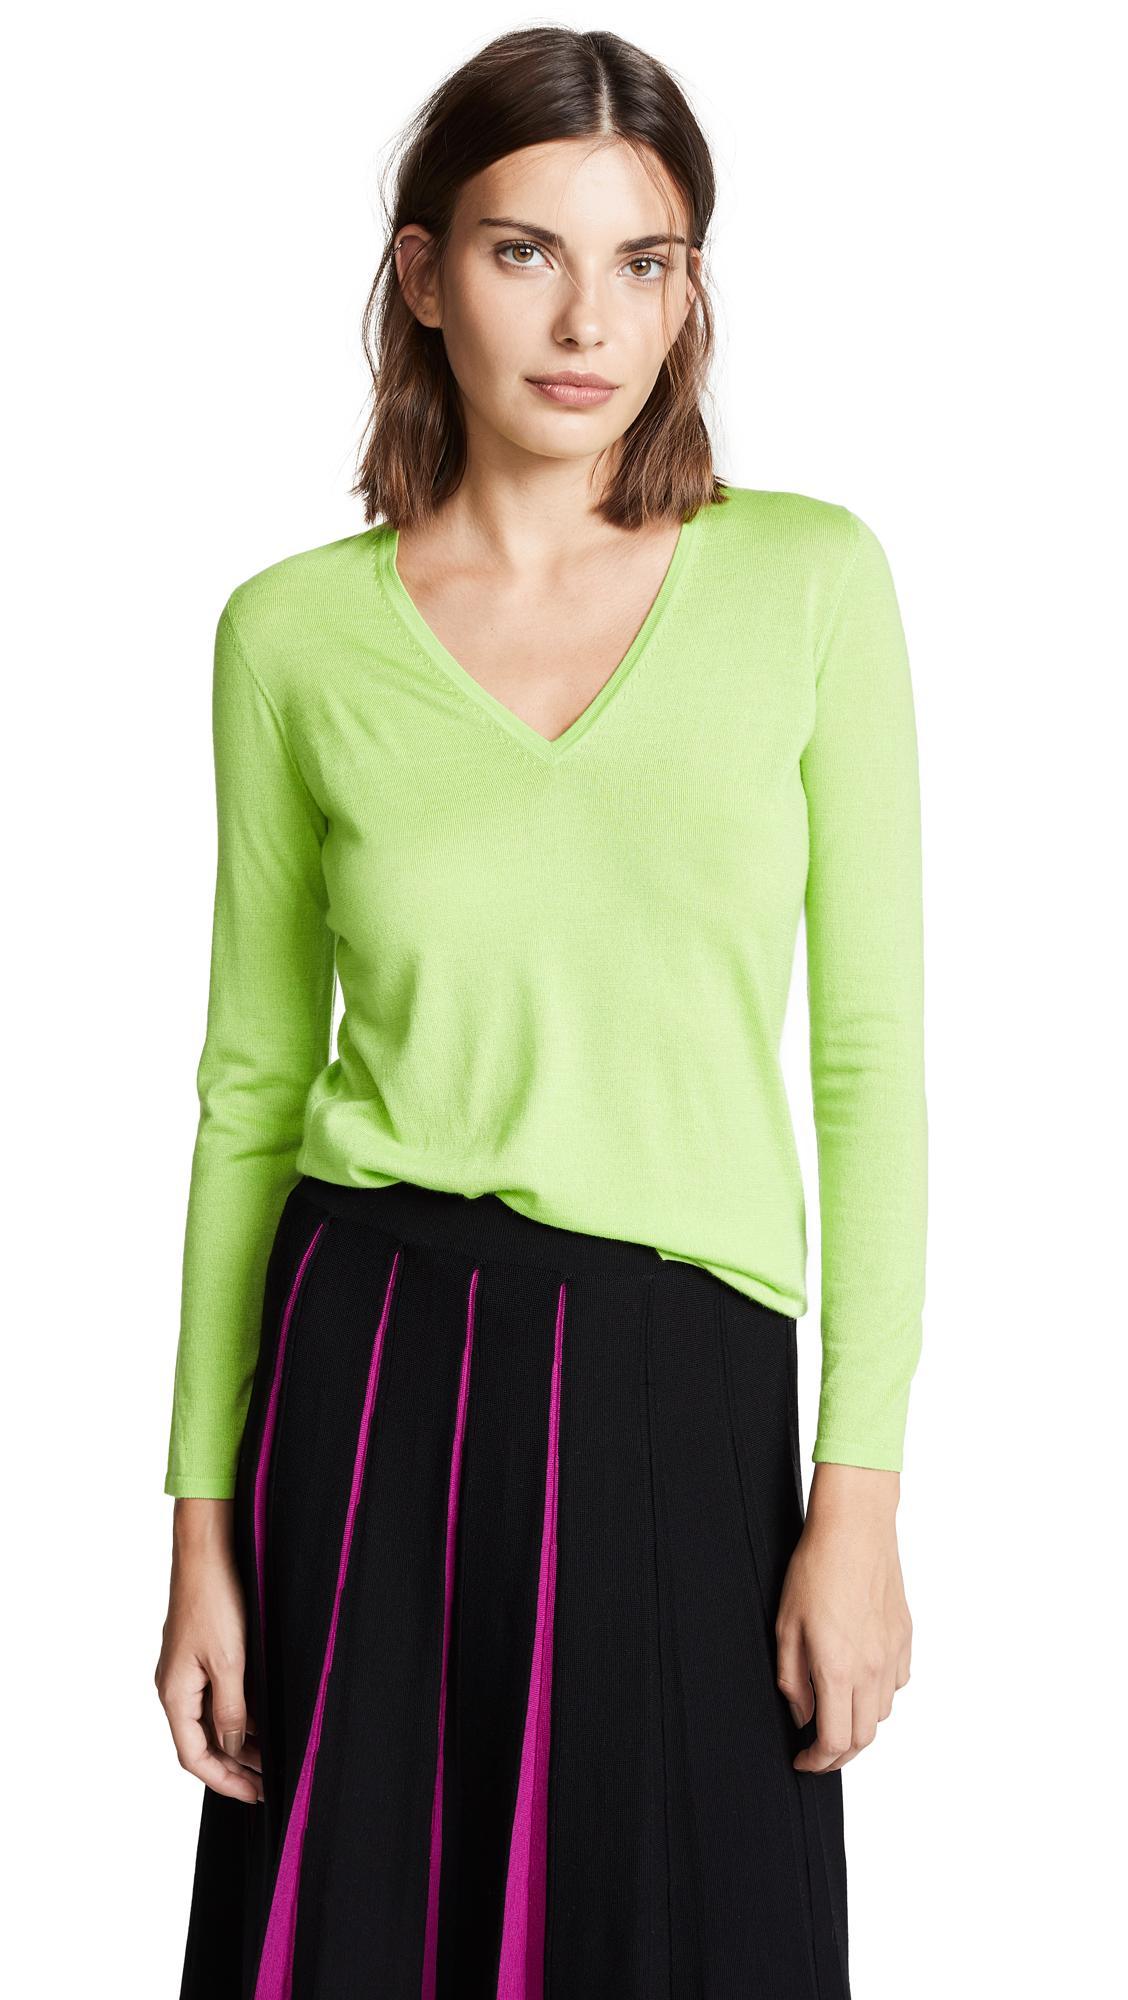 5cc794a69b Tse Cashmere Cashmere V Neck Sweater In Green | ModeSens